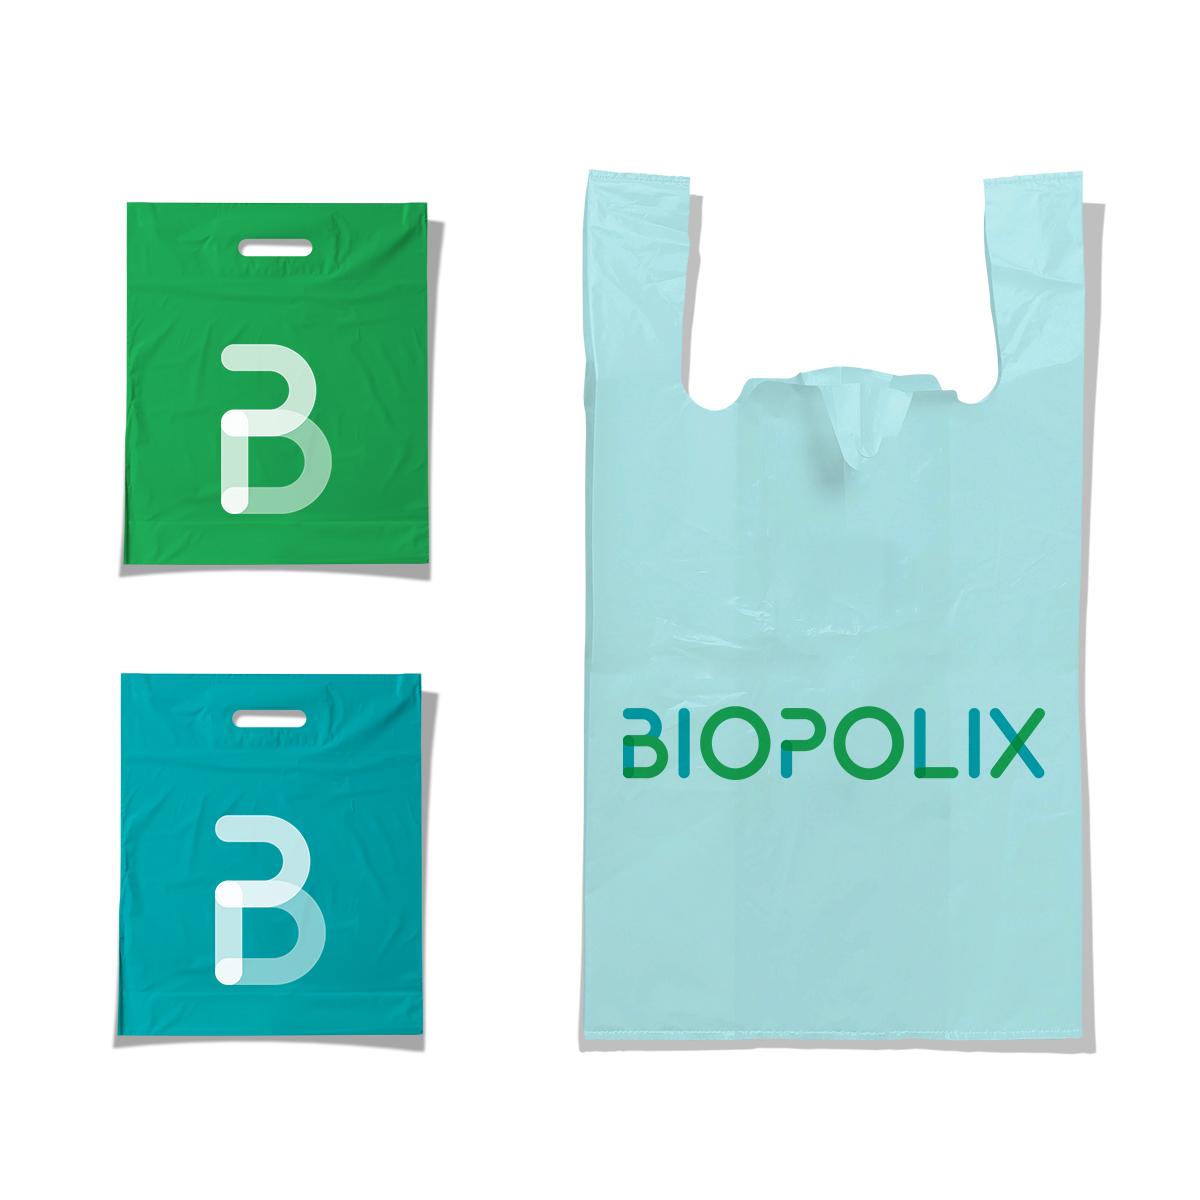 Biopolix_Sacola_mockup.jpg